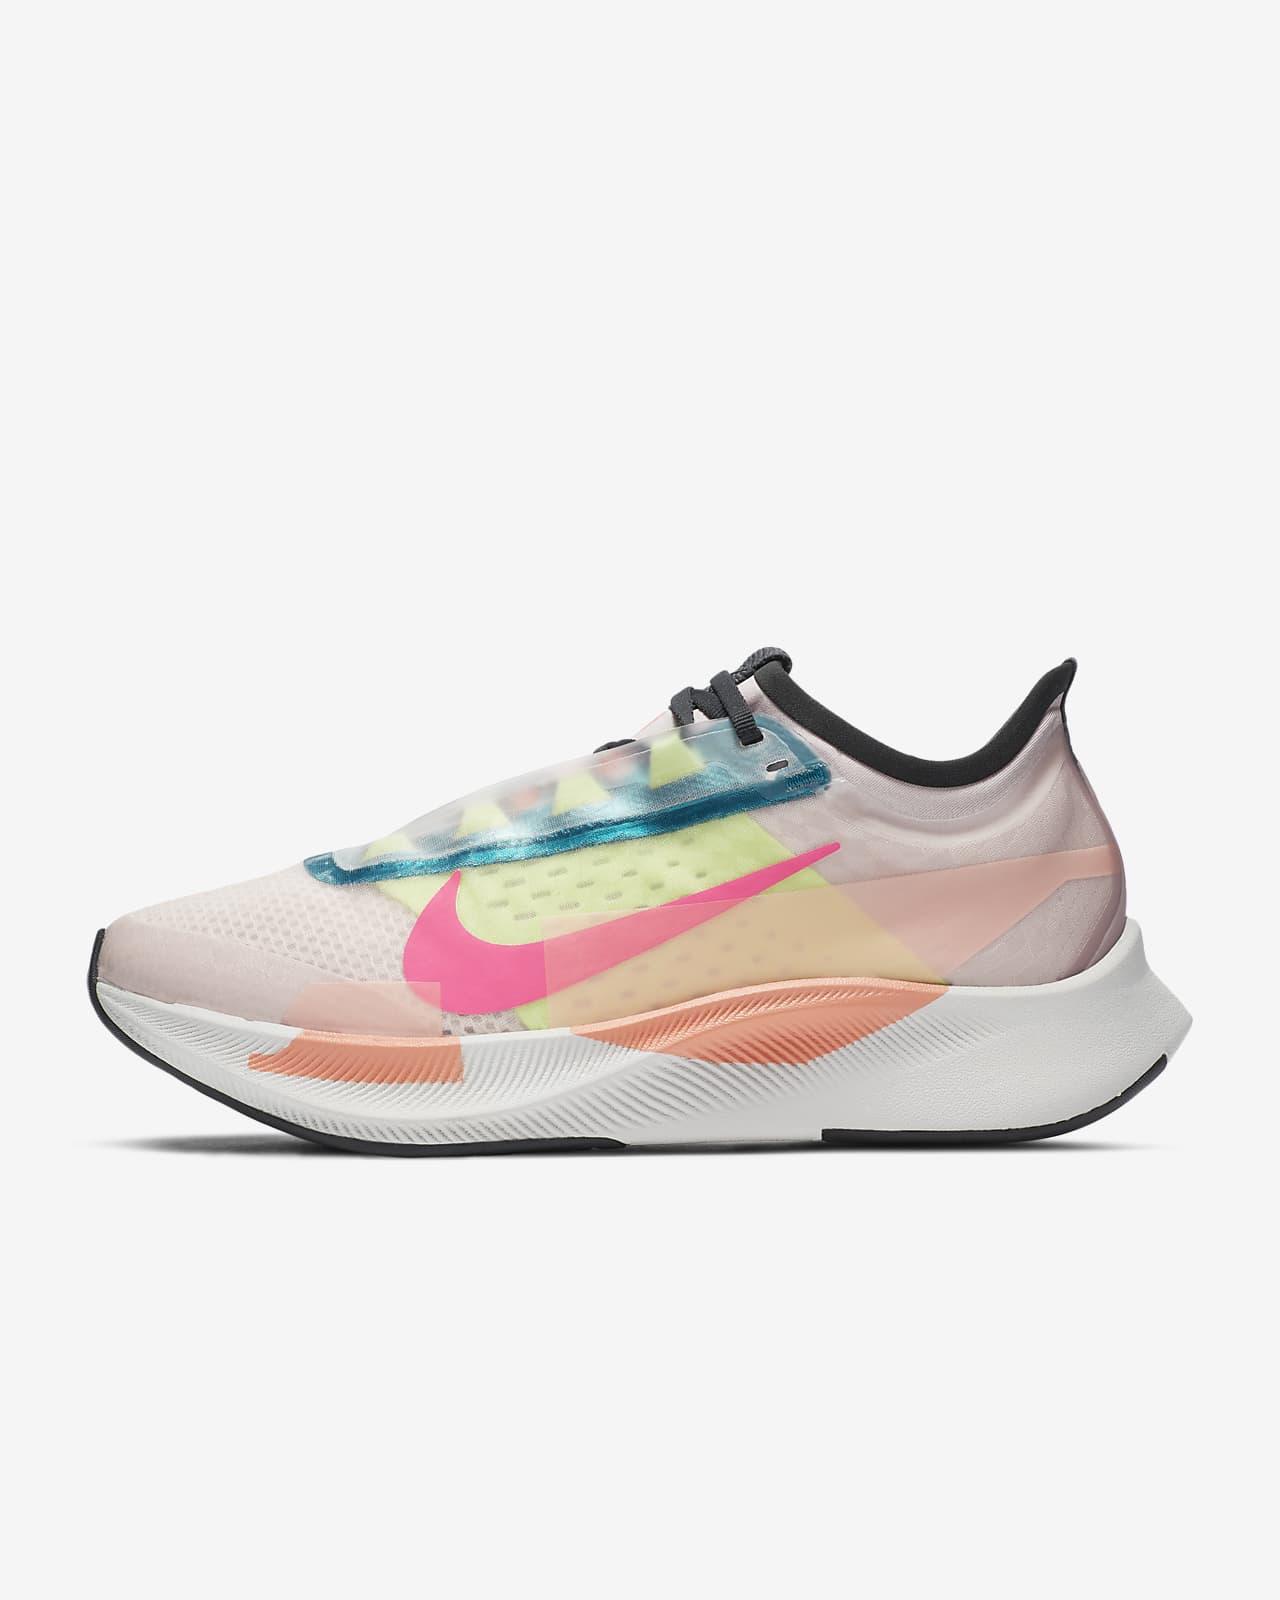 Женские беговые кроссовки Nike Zoom Fly 3 Premium